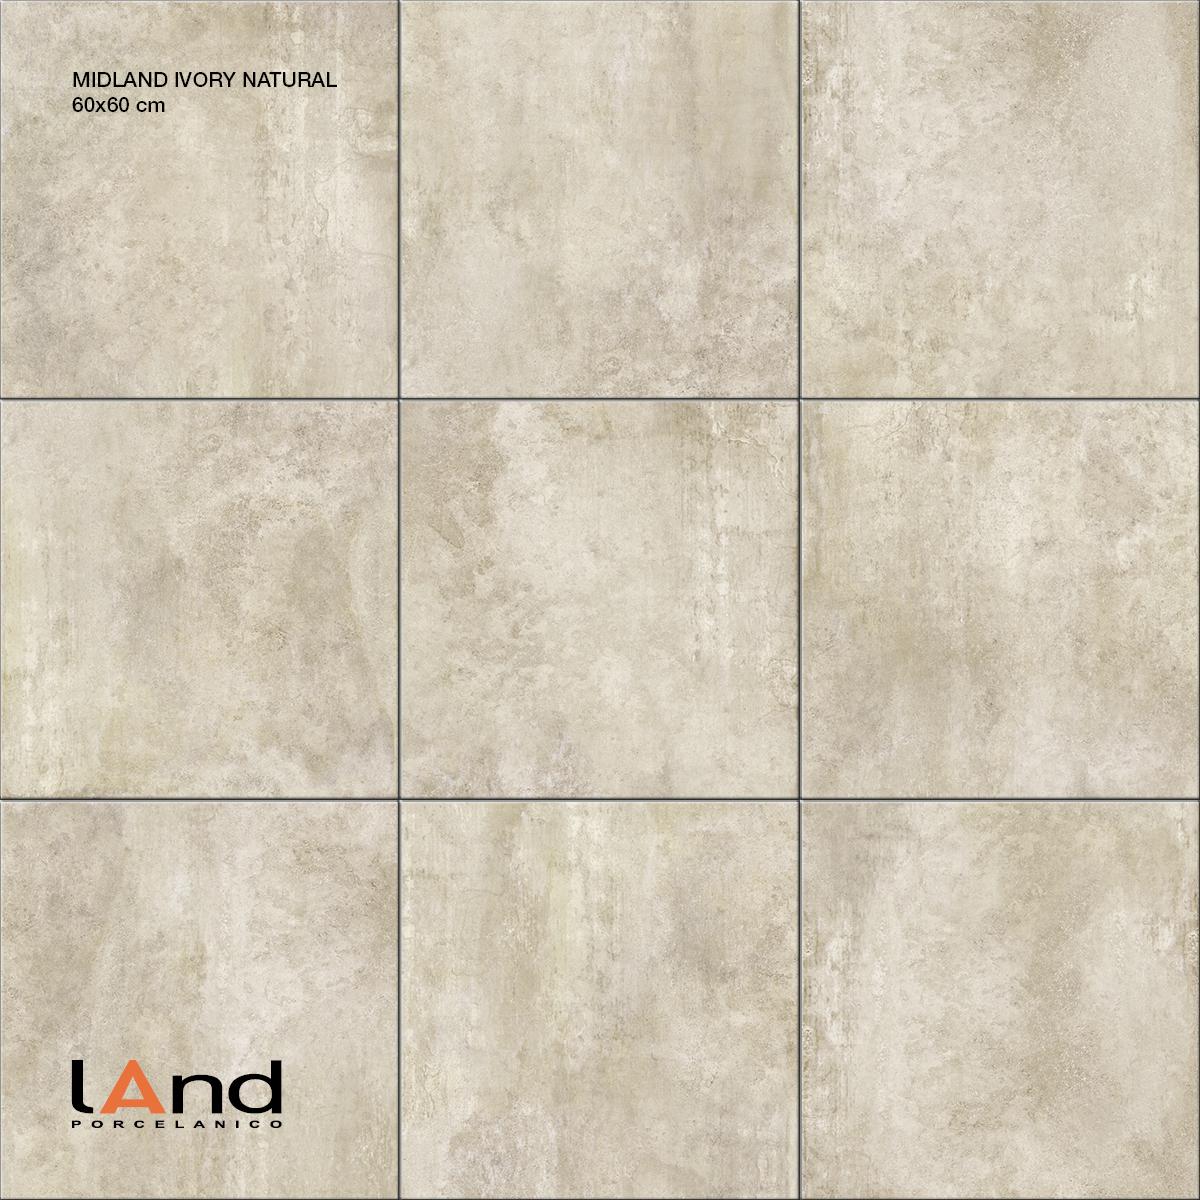 Midland Ivory